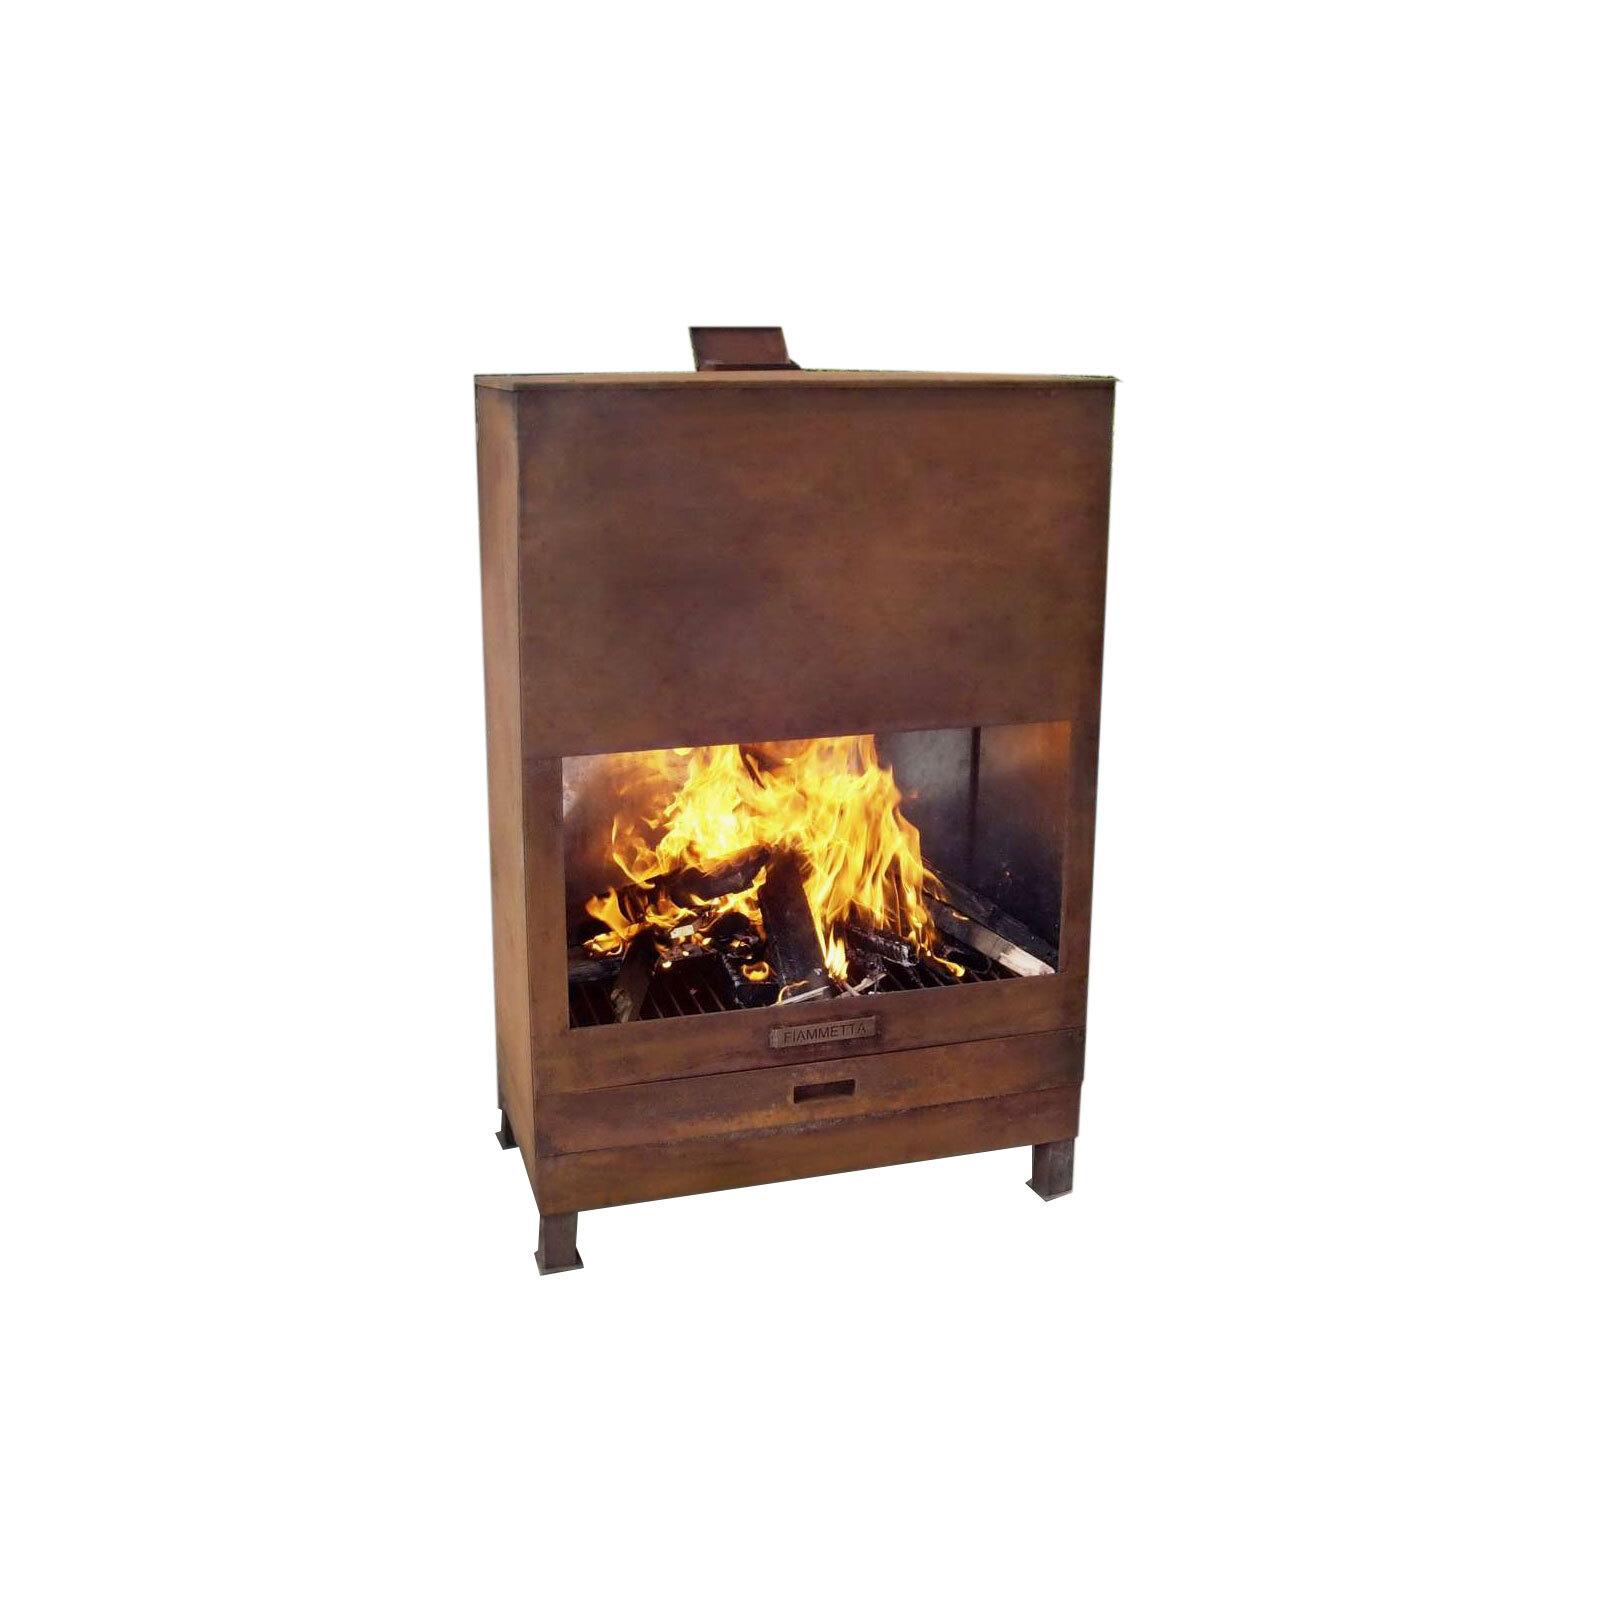 Fiammetta 90 x 49 x 133cm Rustic Fireplace